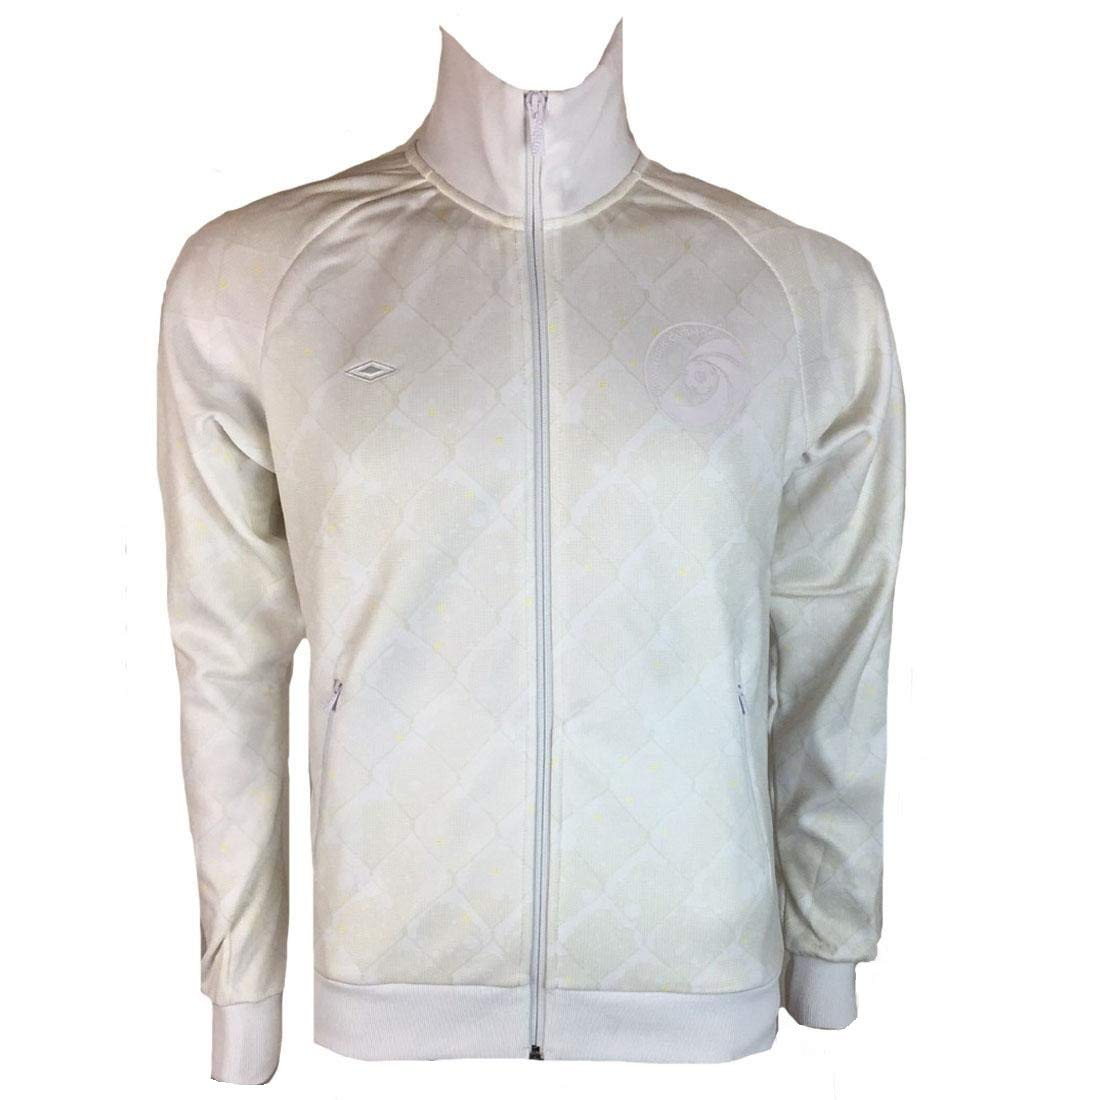 Umbro New York Cosmos Mens Taped Track Jacket Retro Football White